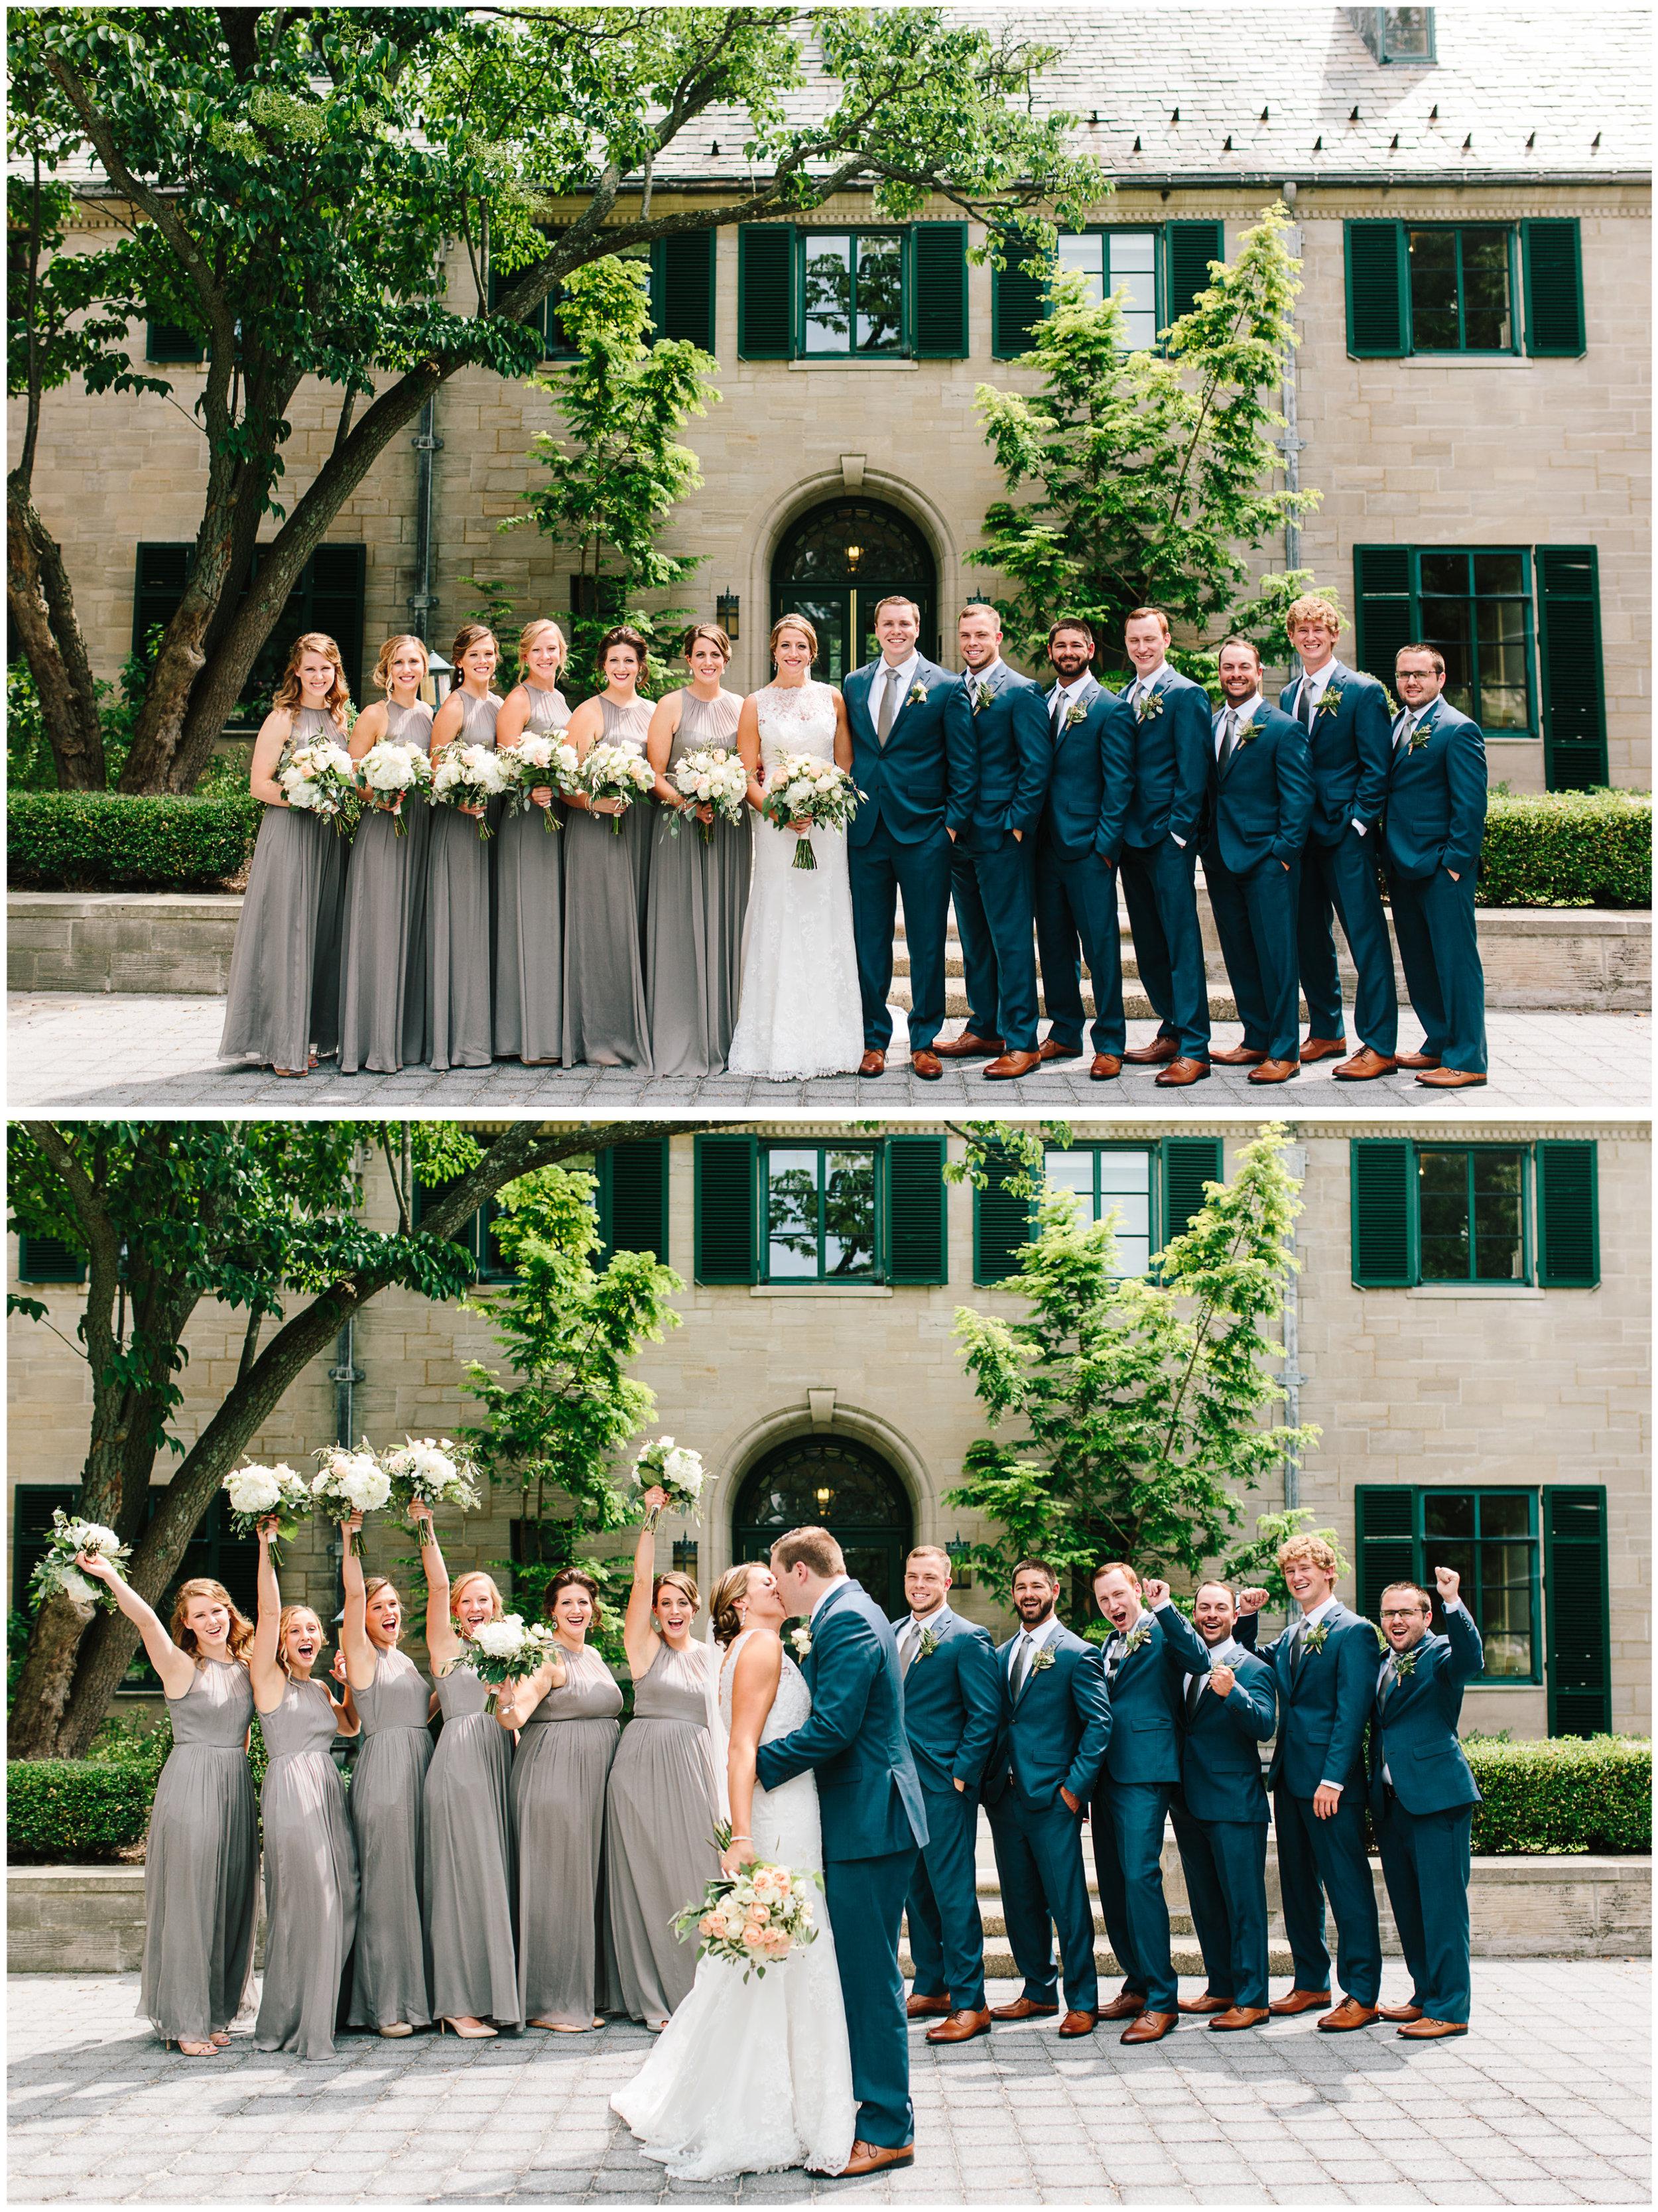 ann_arbor_michigan_wedding_50.jpg